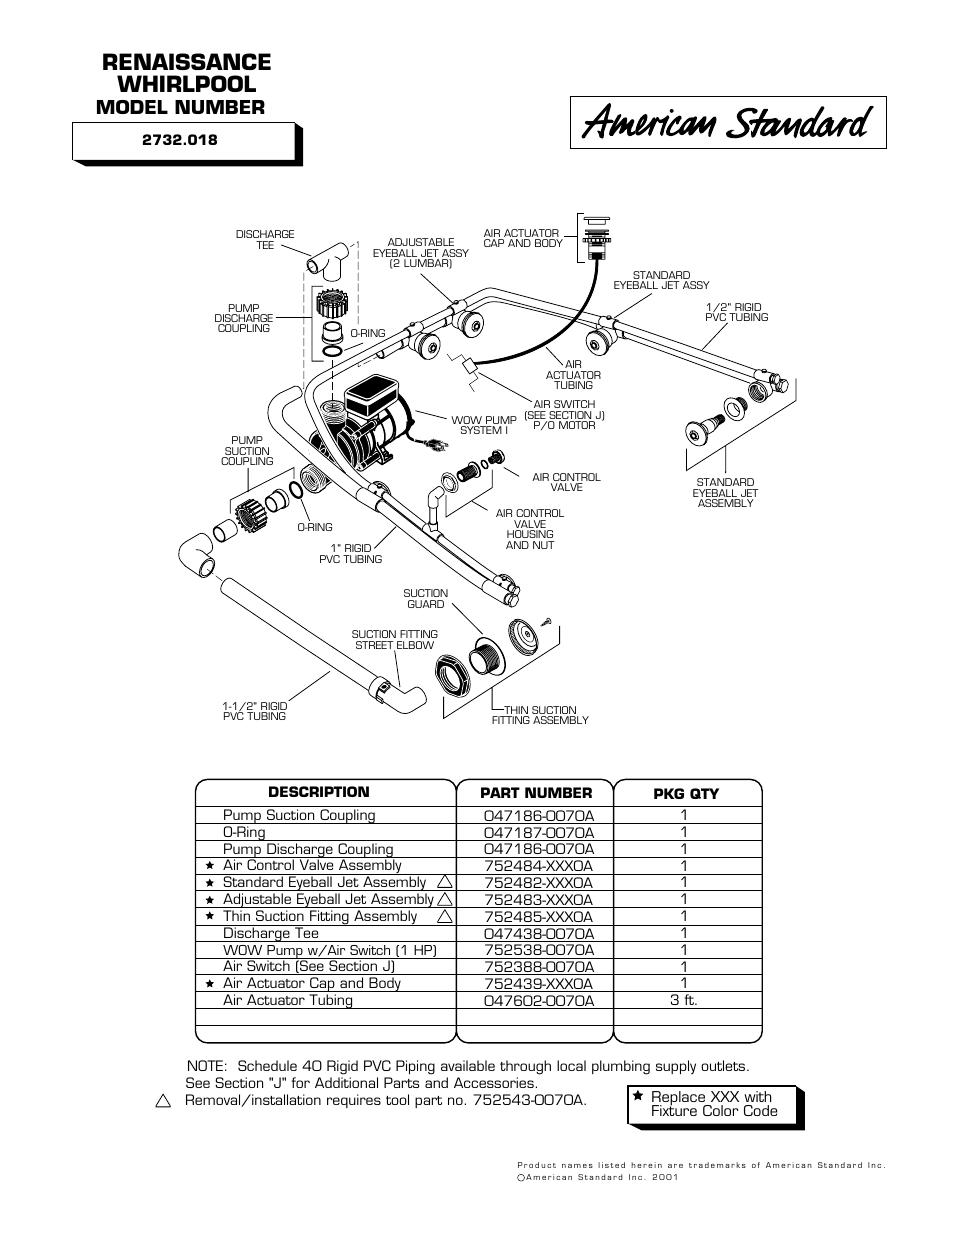 American Standard Whirlpool and Bathing Pool 2732.018 User Manual ...